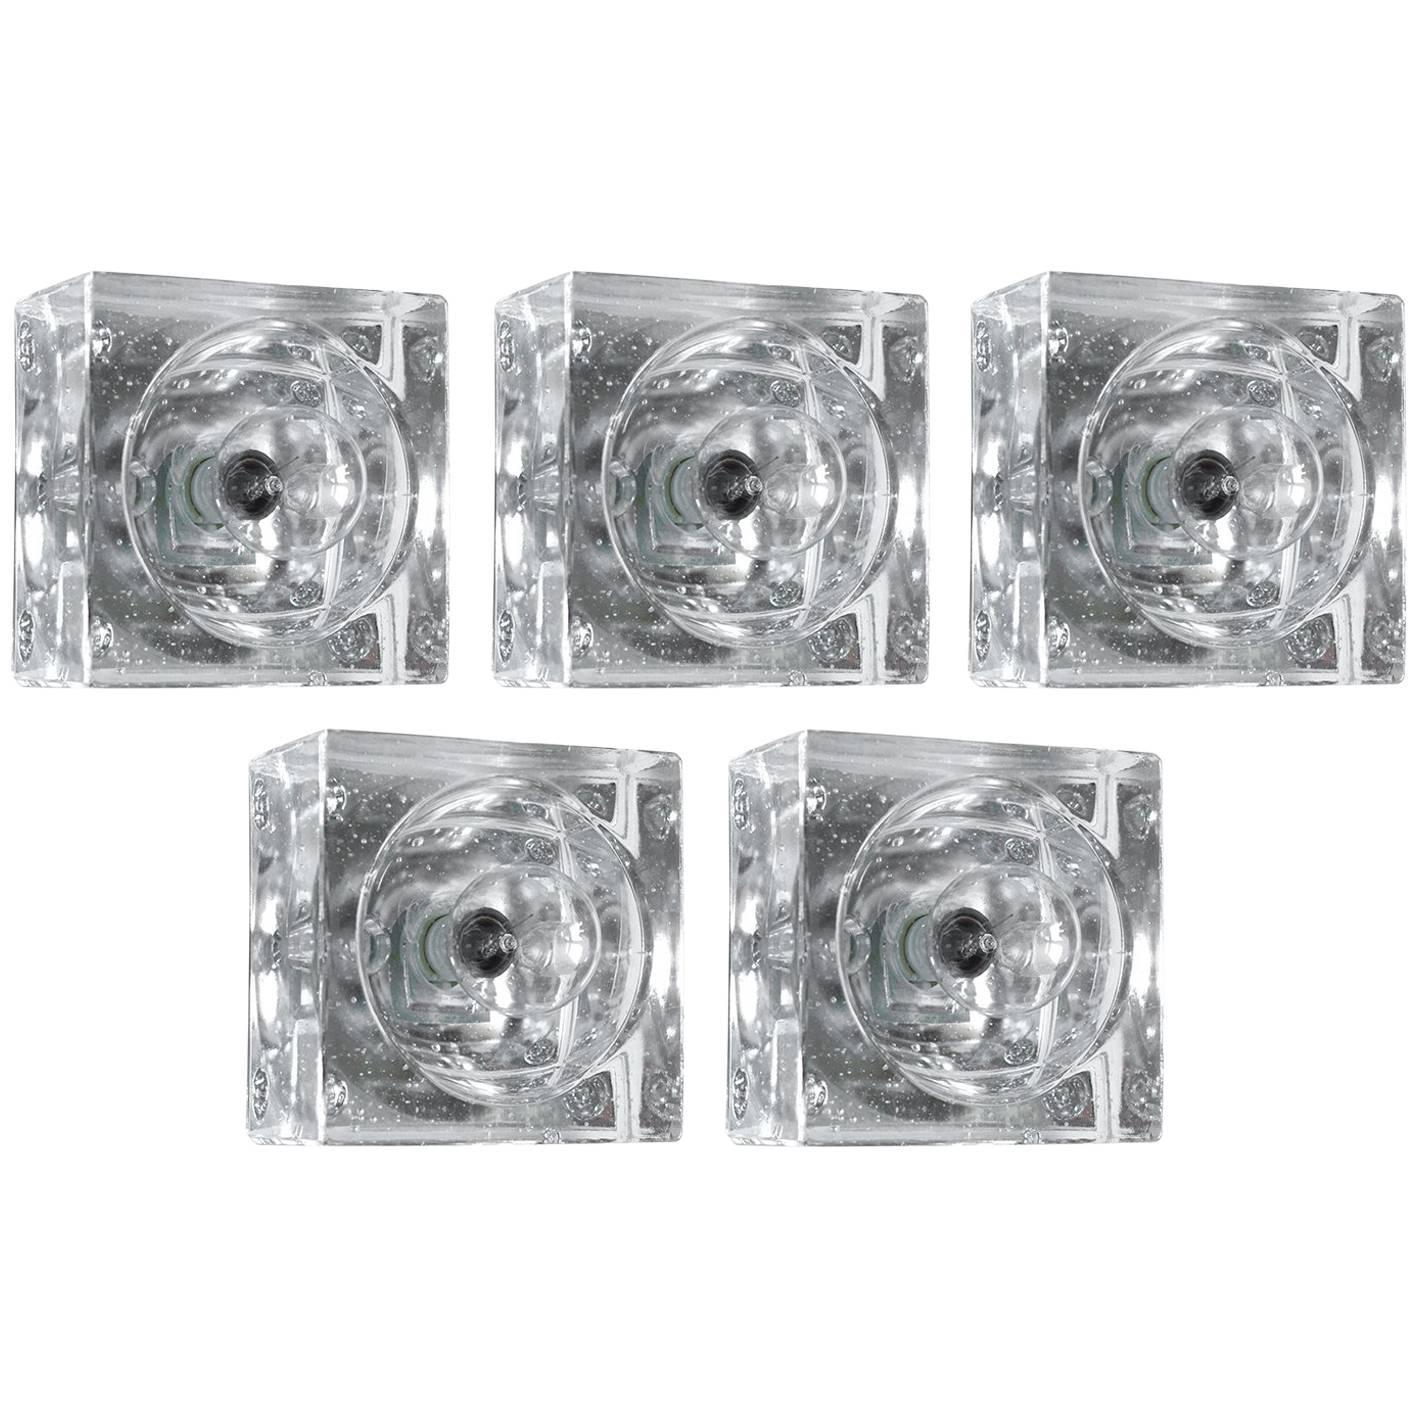 Rare Geometric Glass Ceiling or Wall Flush Mounts Sconces, 1960s